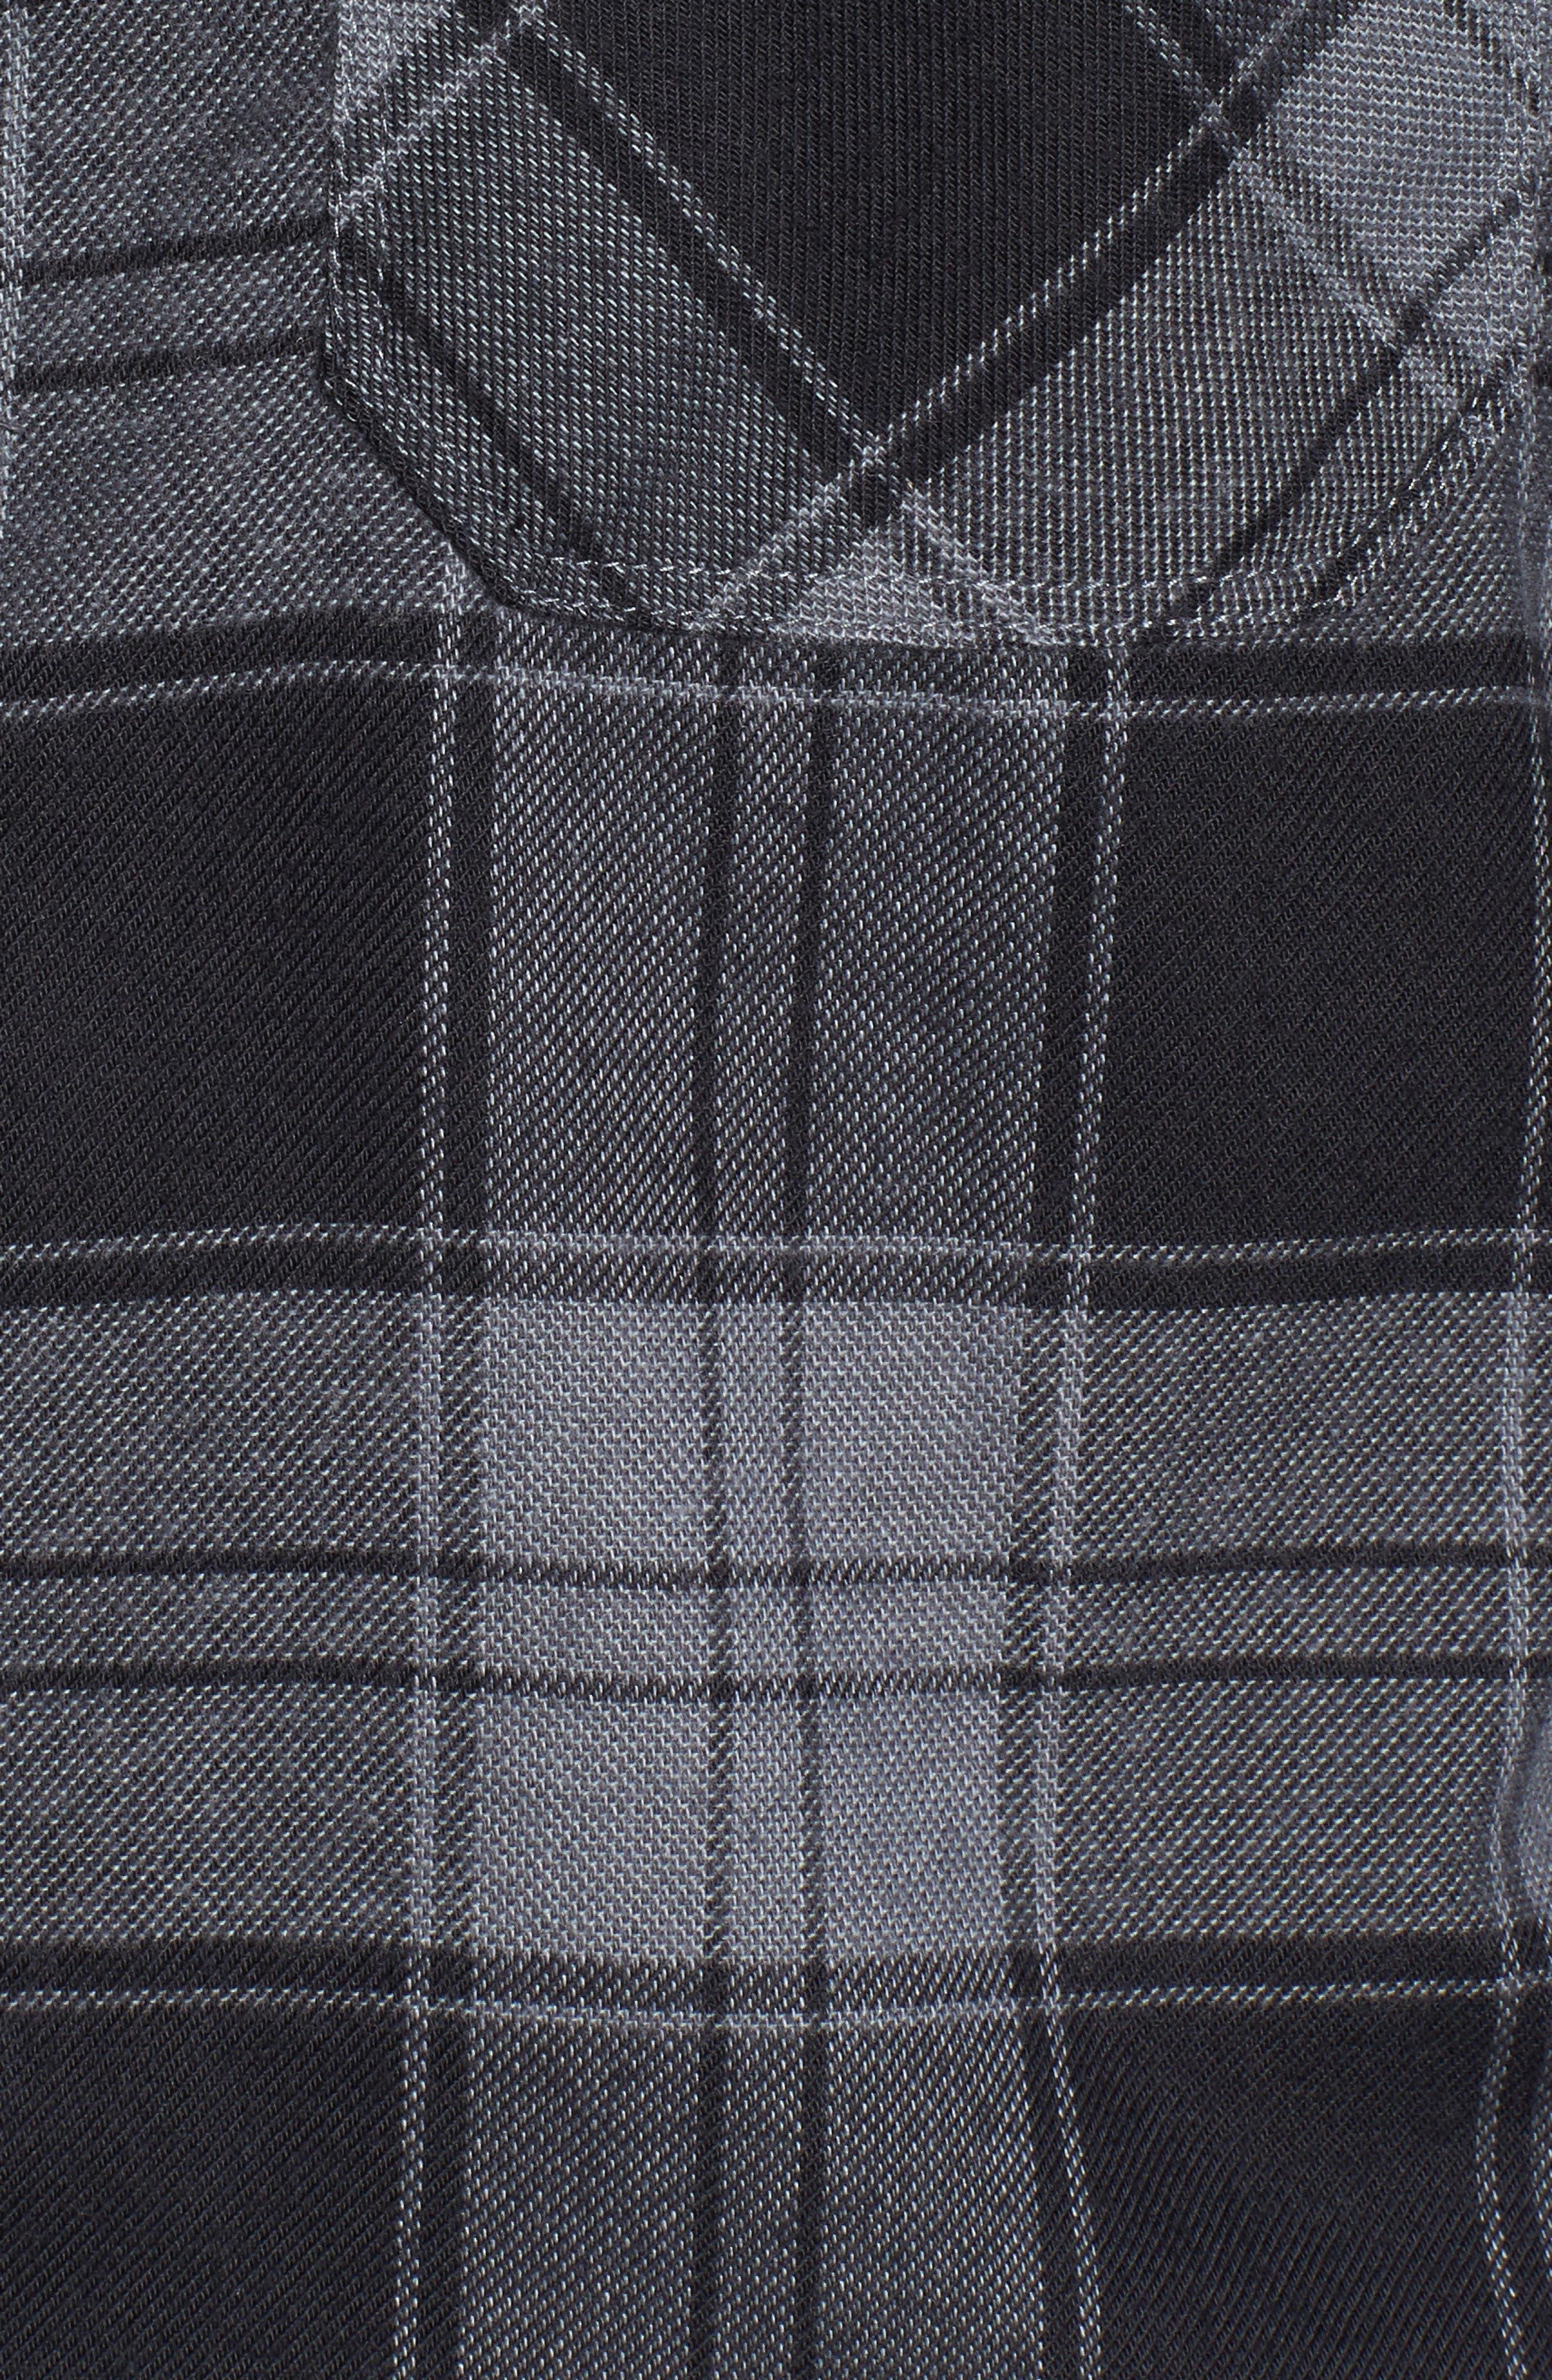 Check Dri-FIT Shirt,                             Alternate thumbnail 5, color,                             010